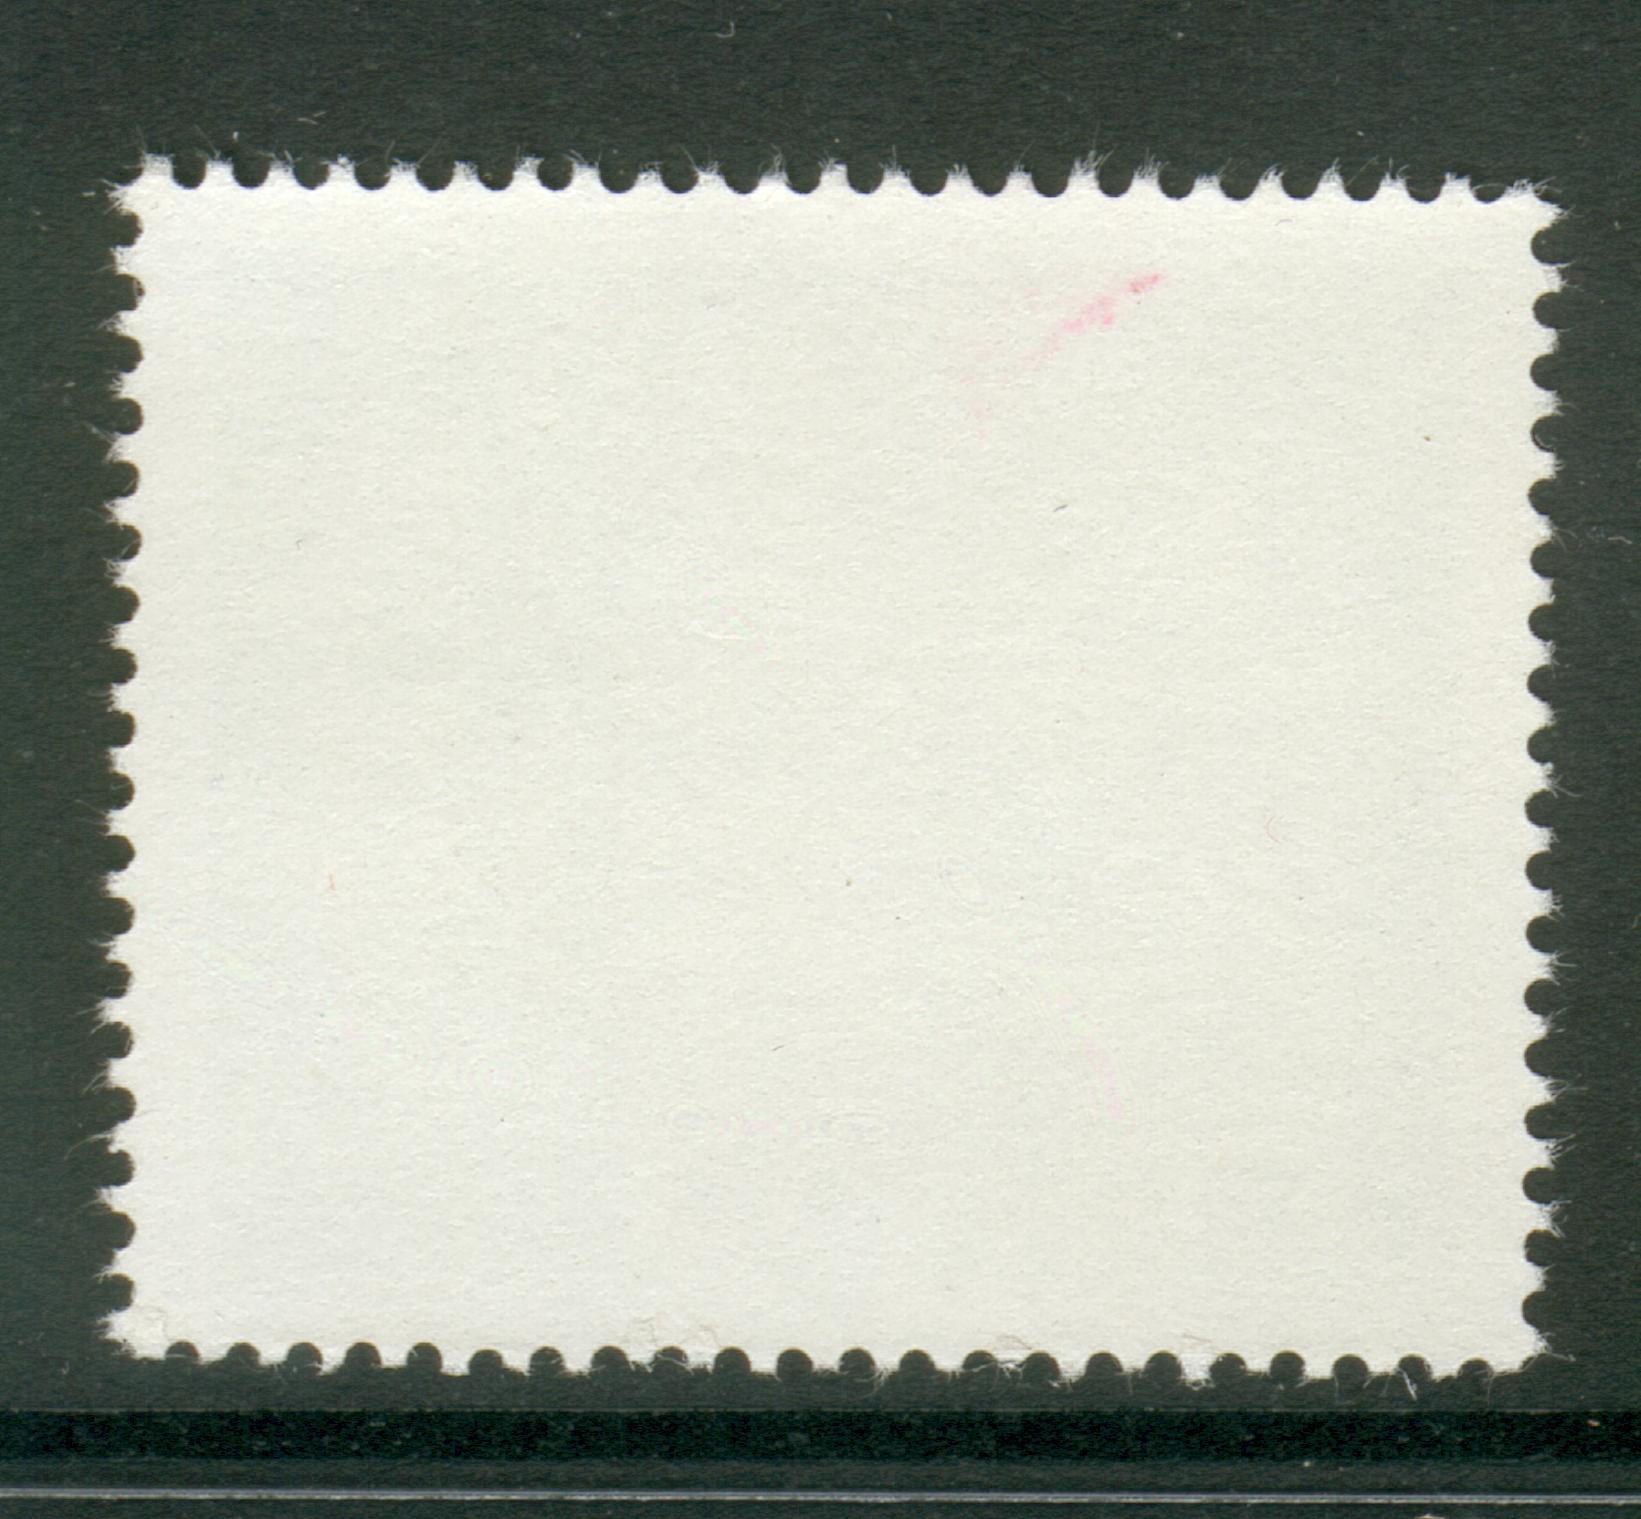 hb65-2.jpg